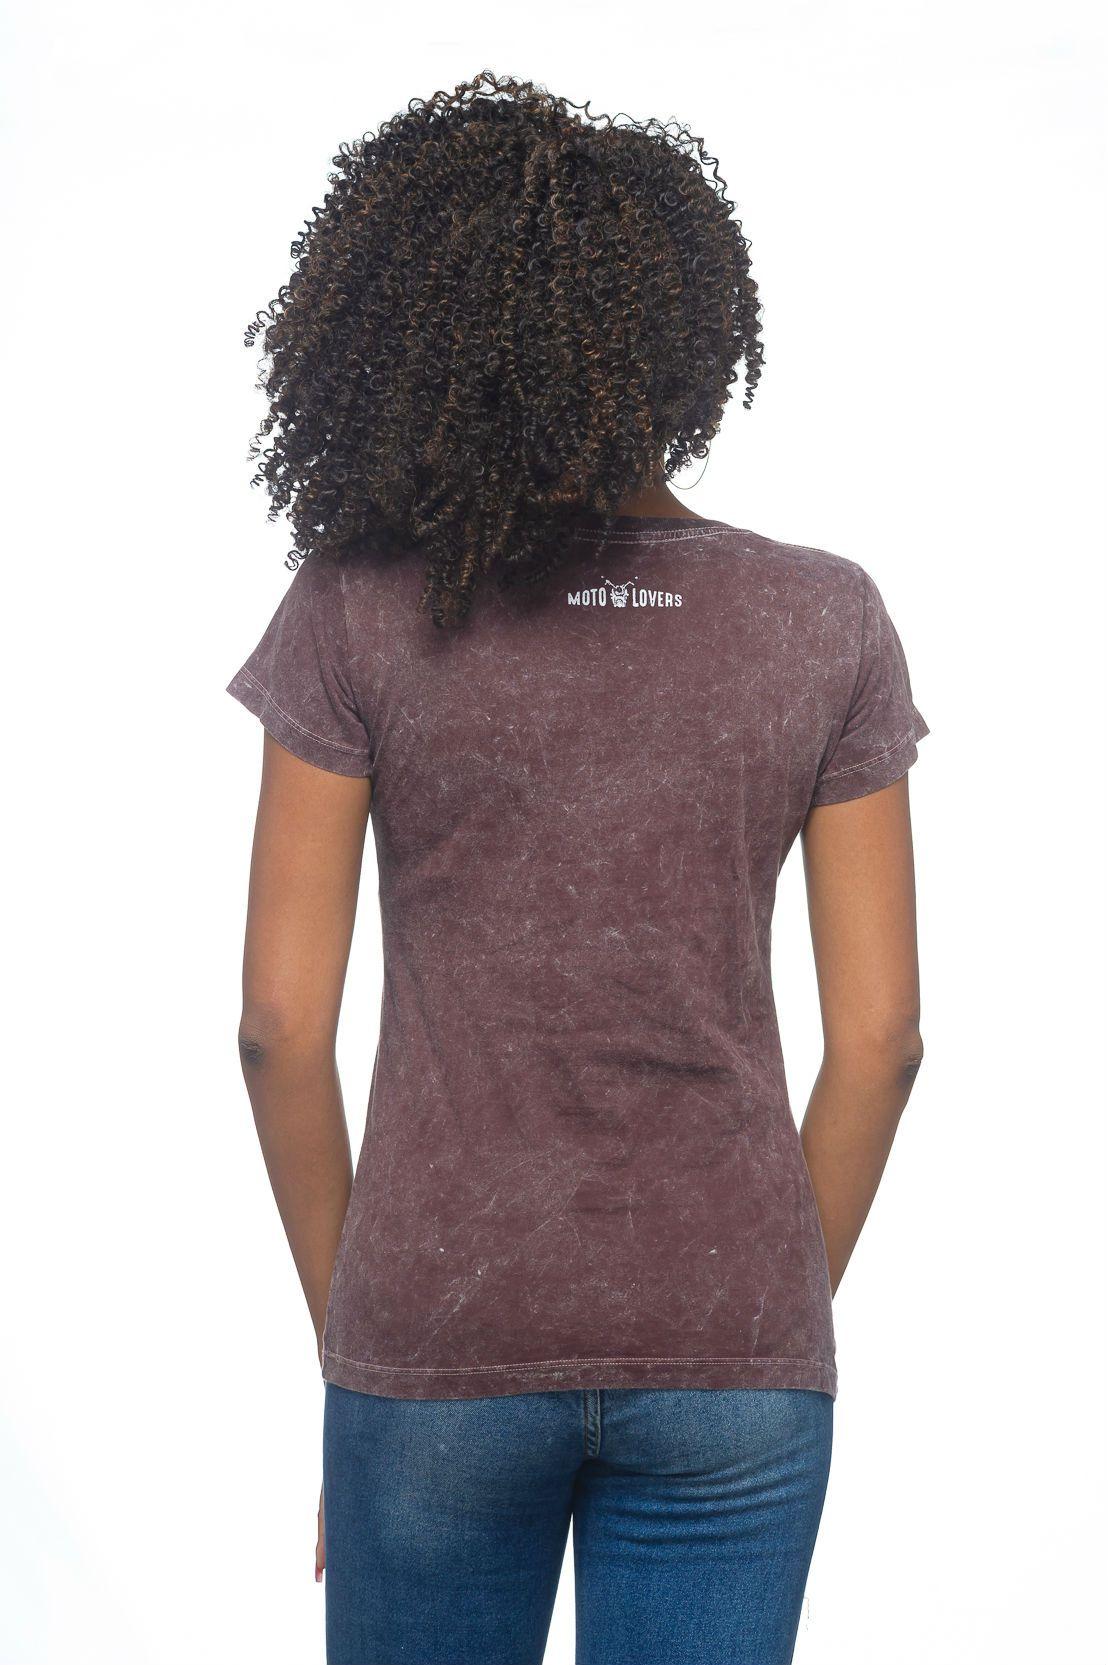 Camiseta Feminina Pilote e Divirta-se